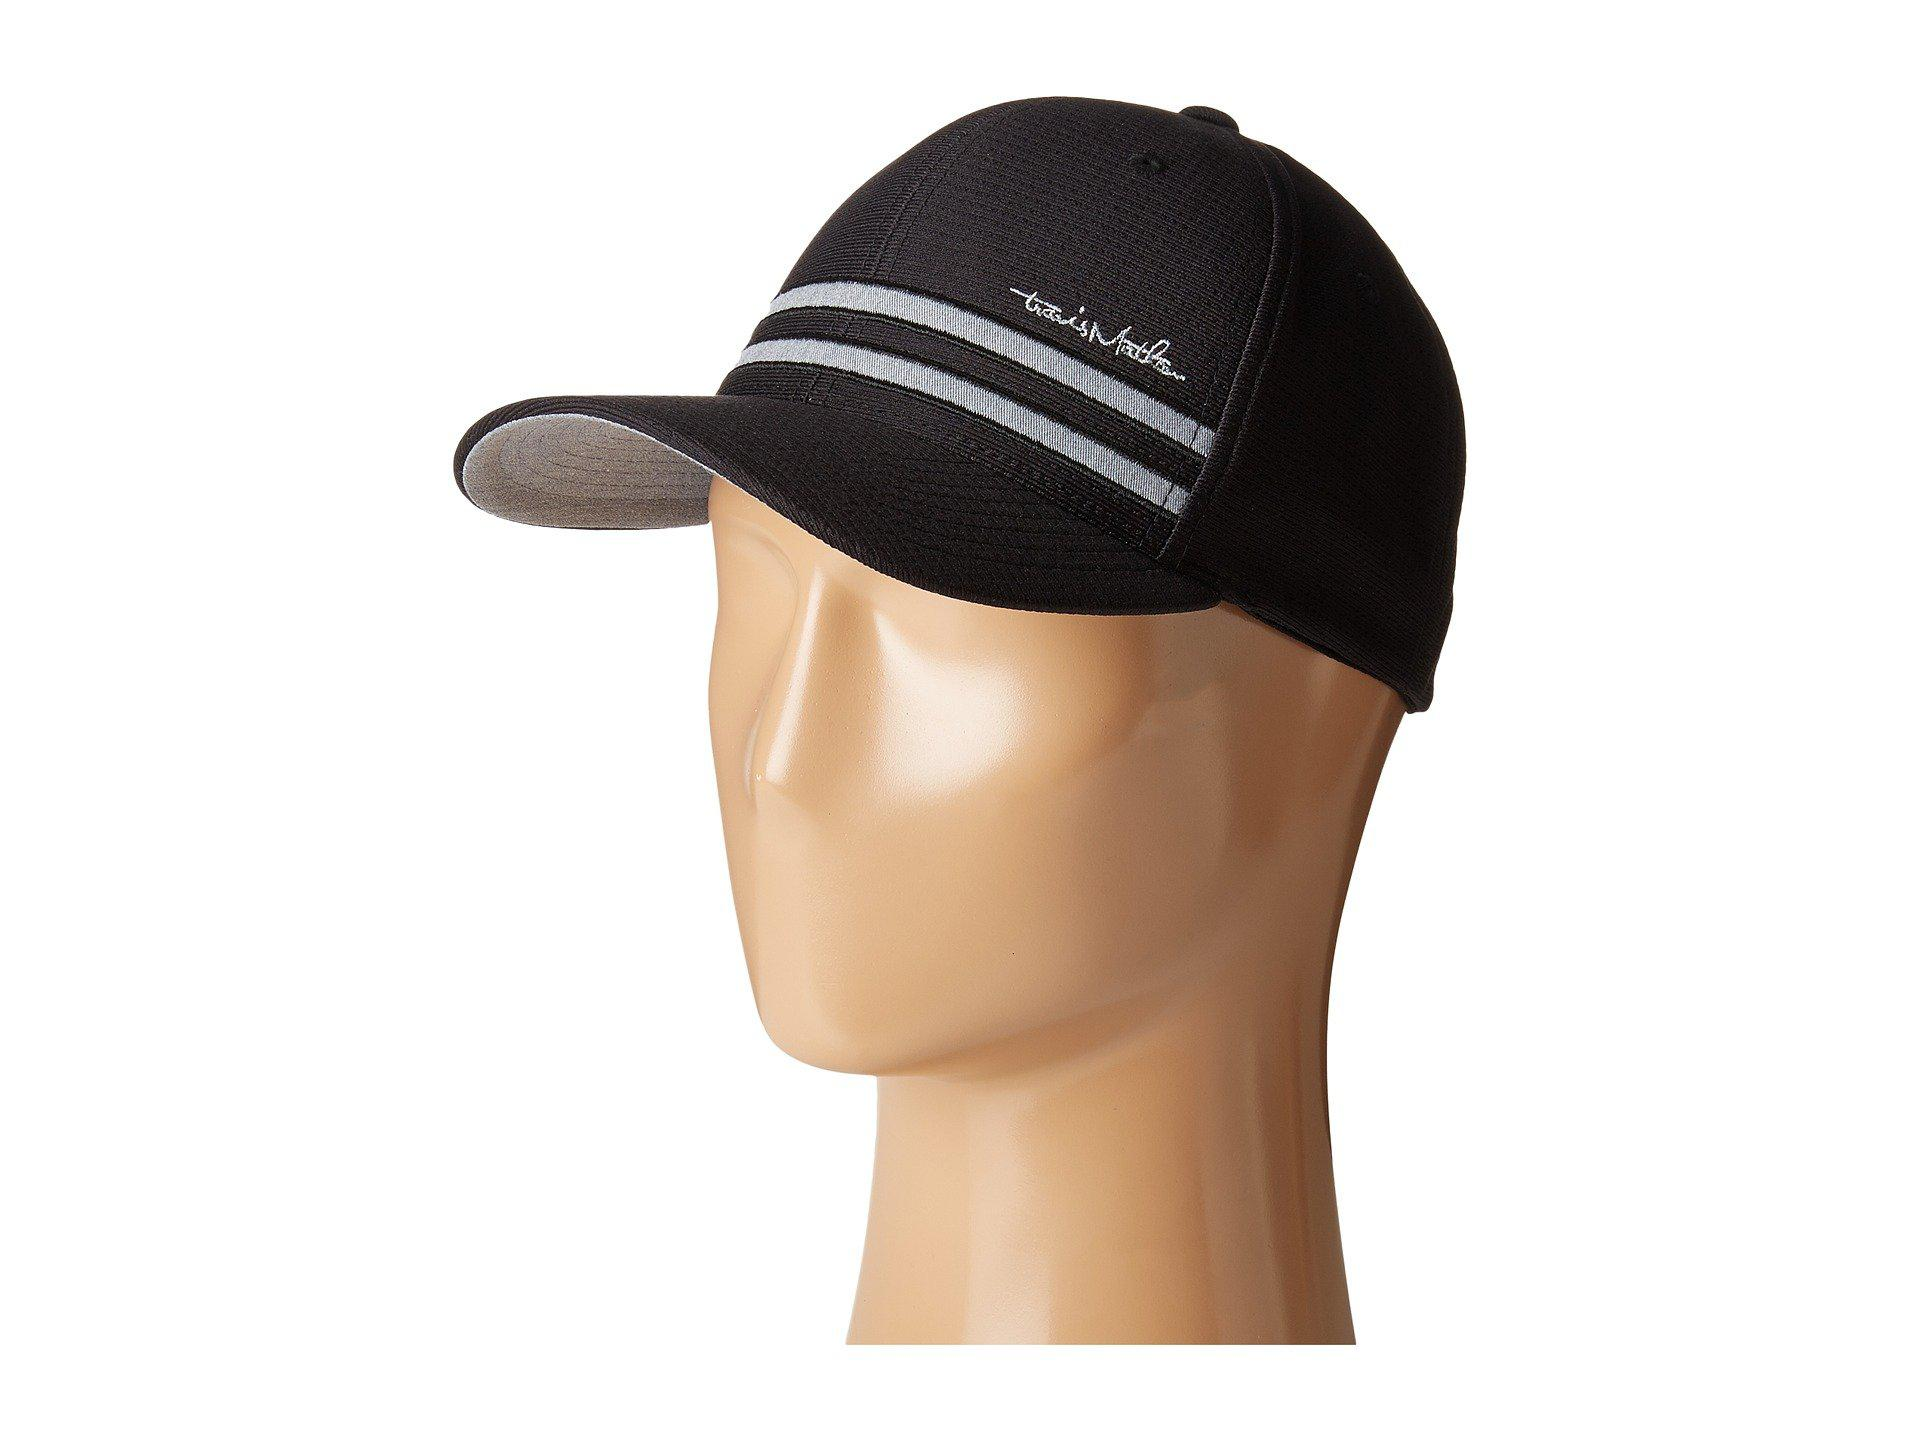 Lyst - Travis Mathew Hout (black) Caps in Black for Men bff51ec932bd